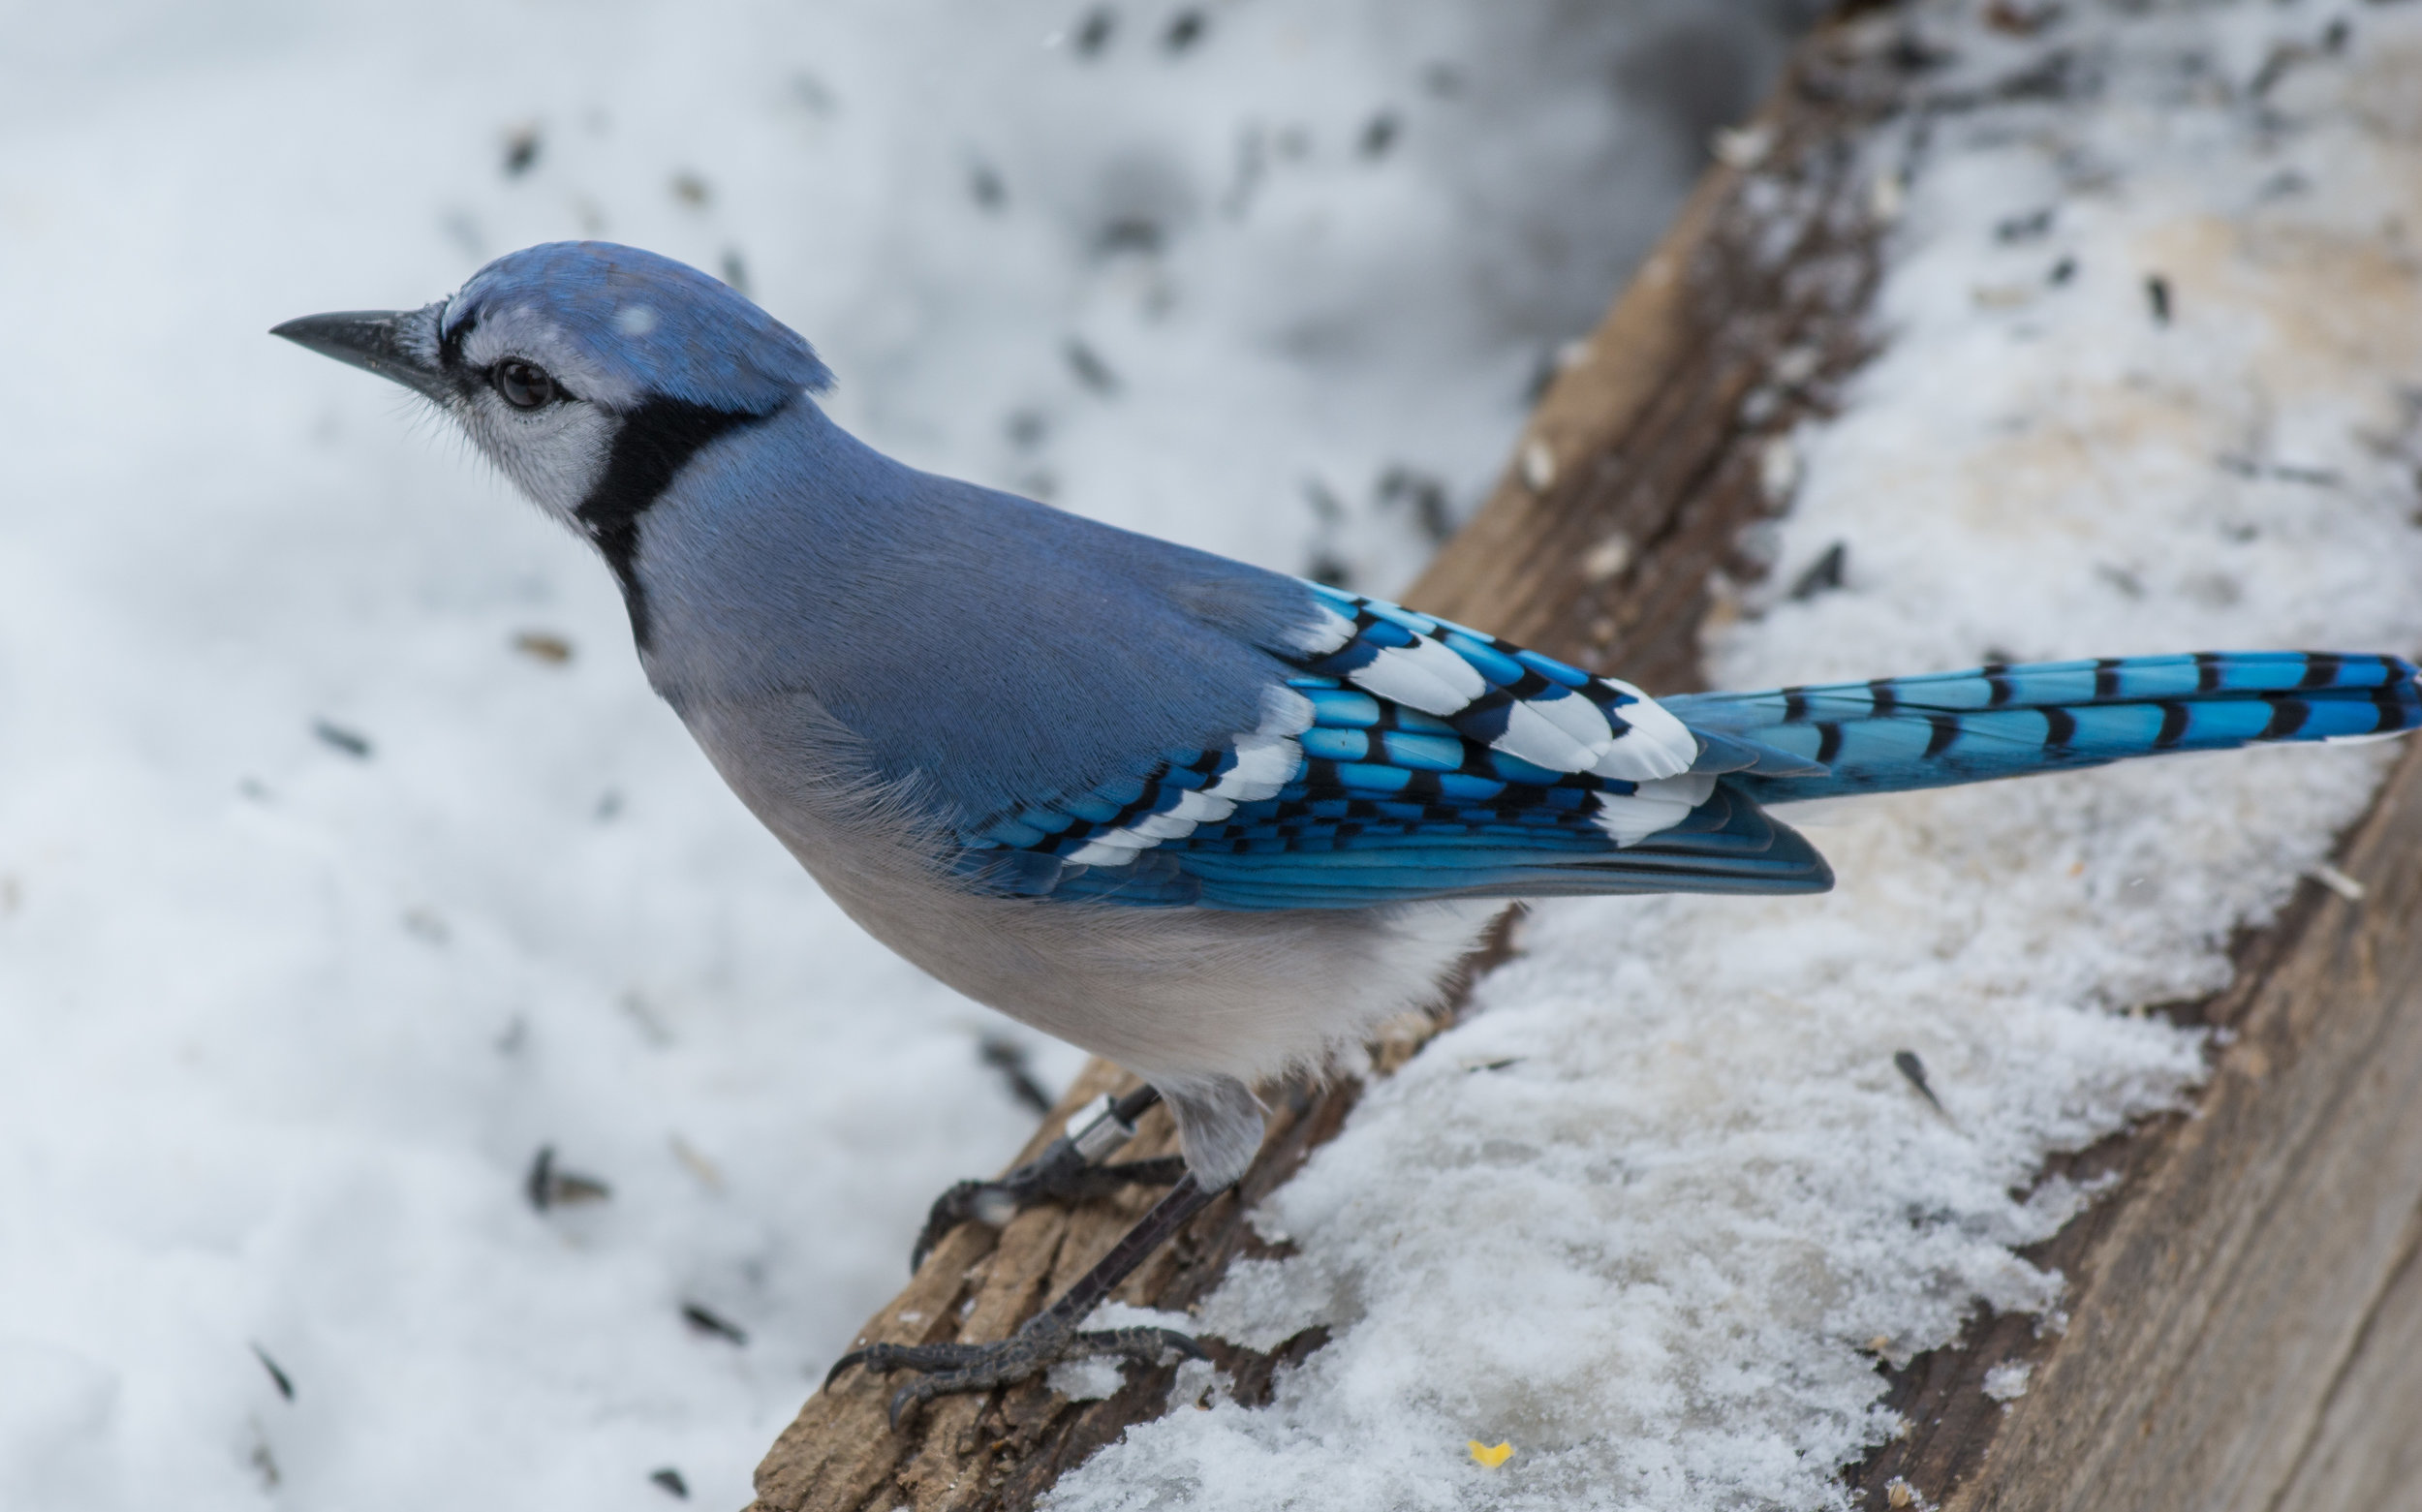 Blue Jay (Cyanocitta cristata) - Barr Lake SP, Adams Co. (CO)  EQ: D7100, 70-200mm f/4.0  Taken: 2-26-2015 at 12:35   Settings: 300 mm (35mm eqiv), 1/500s, f/5.6, ISO100, +2/3EV  Conditions: Snow